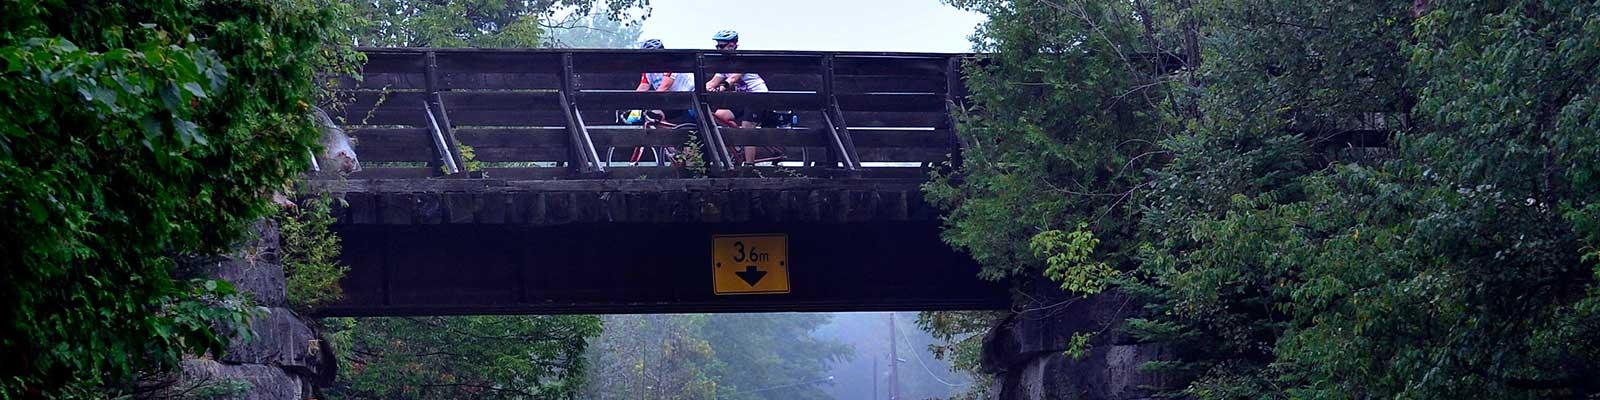 Photo-CaledonTrail-Bridge-2015-08-19-Great-Waterfront-Trail-Adventure-2015-Greenbelt-Route-Special-Edition_c_Simon-Wilson-277.jpg